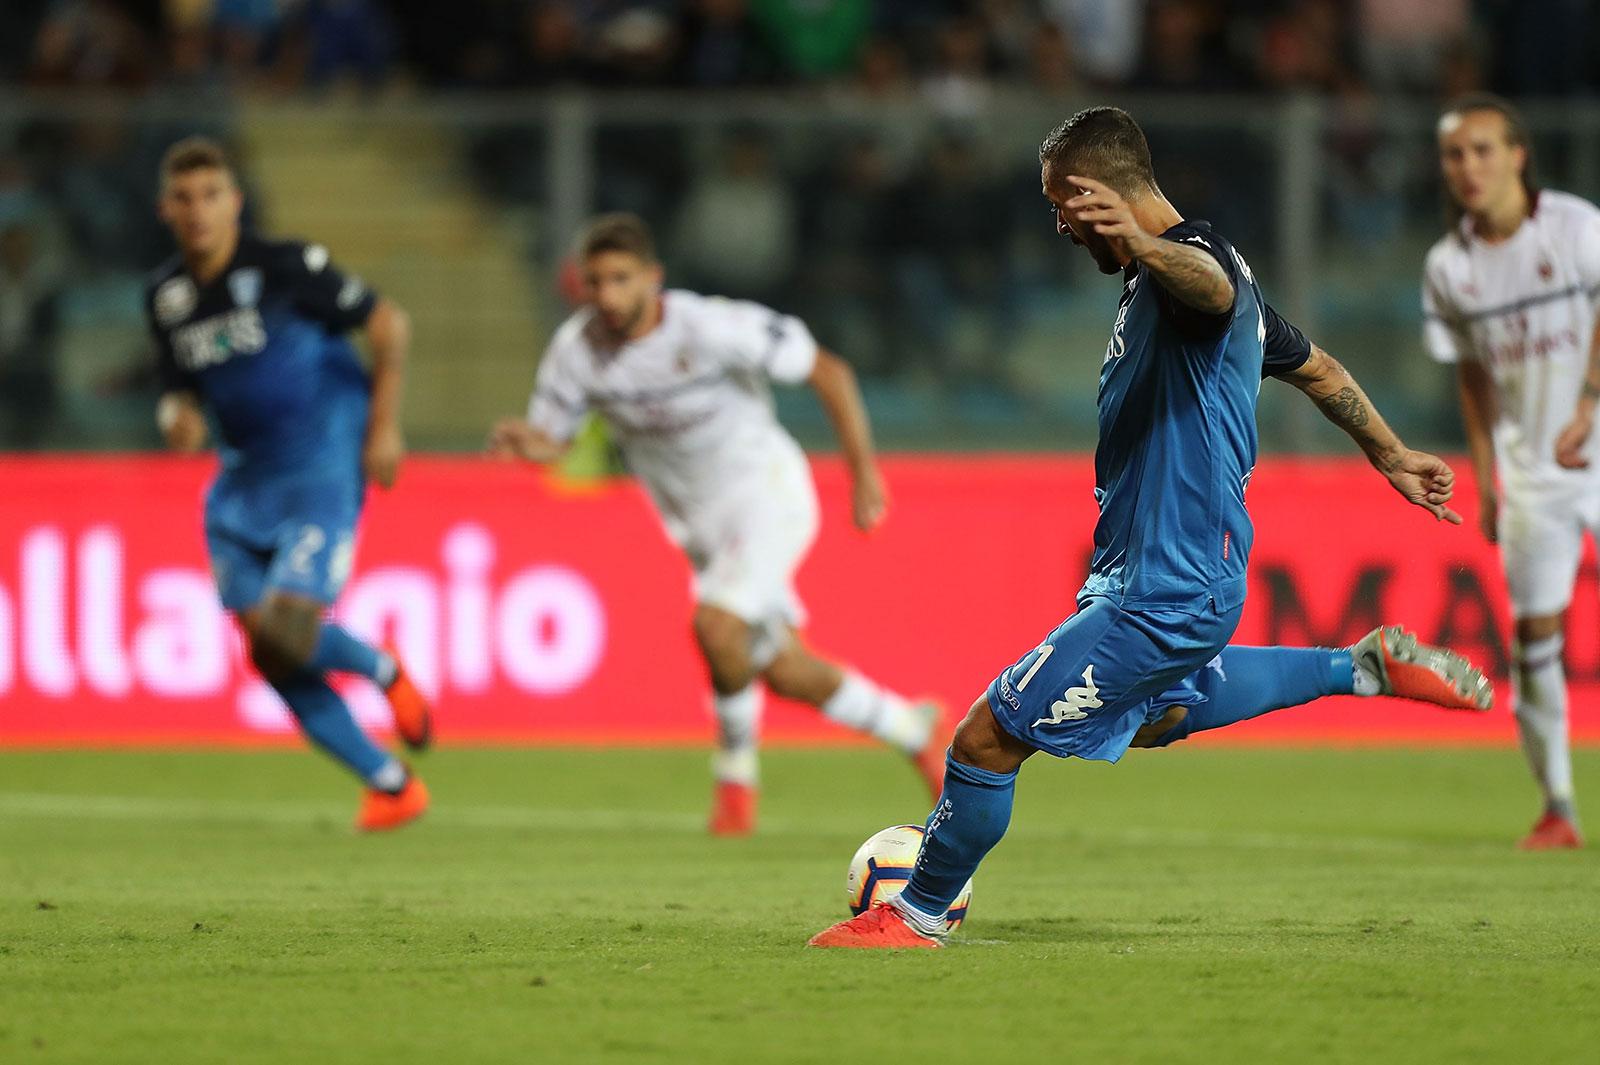 Francesco Caputo scoring a penalty during Empoli-Milan at Stadio Carlo Castellani on September 27, 2018. (Photo by Gabriele Maltinti/Getty Images)